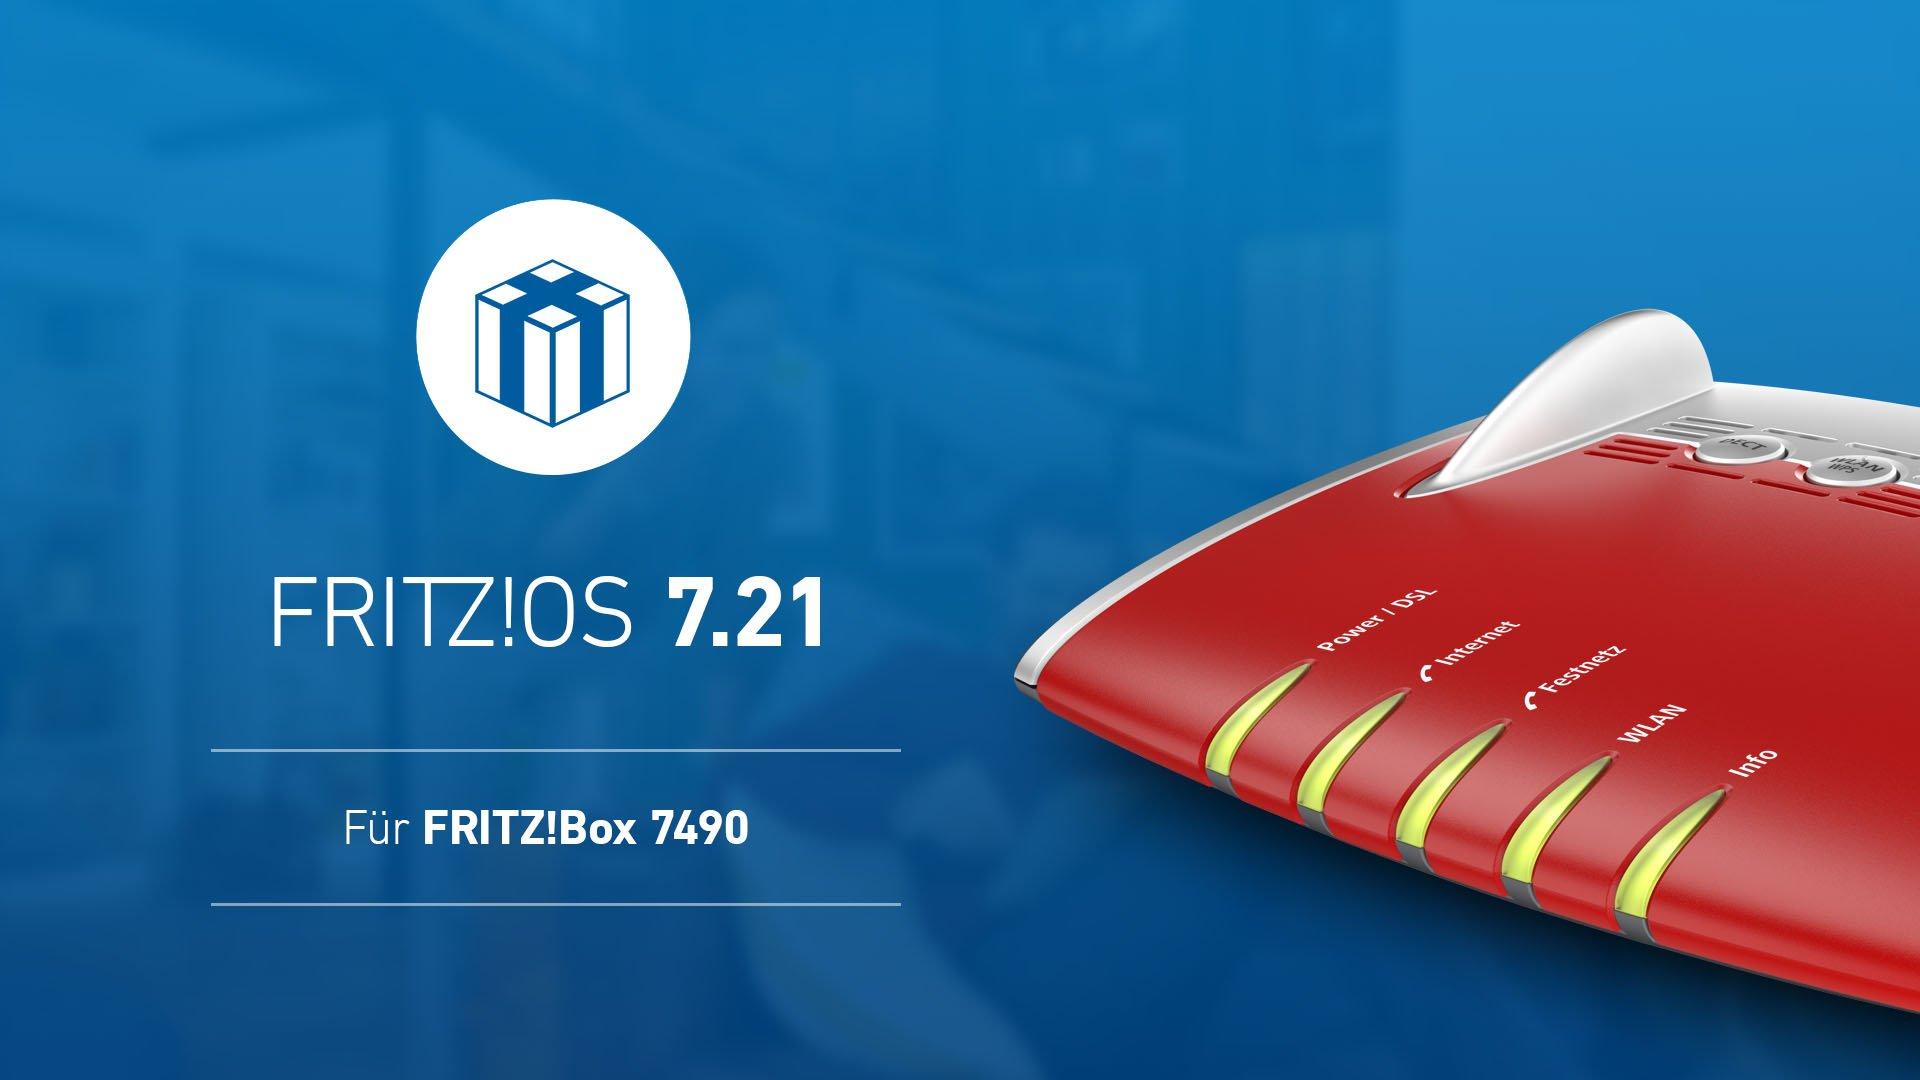 FritzBox 7490 7.21